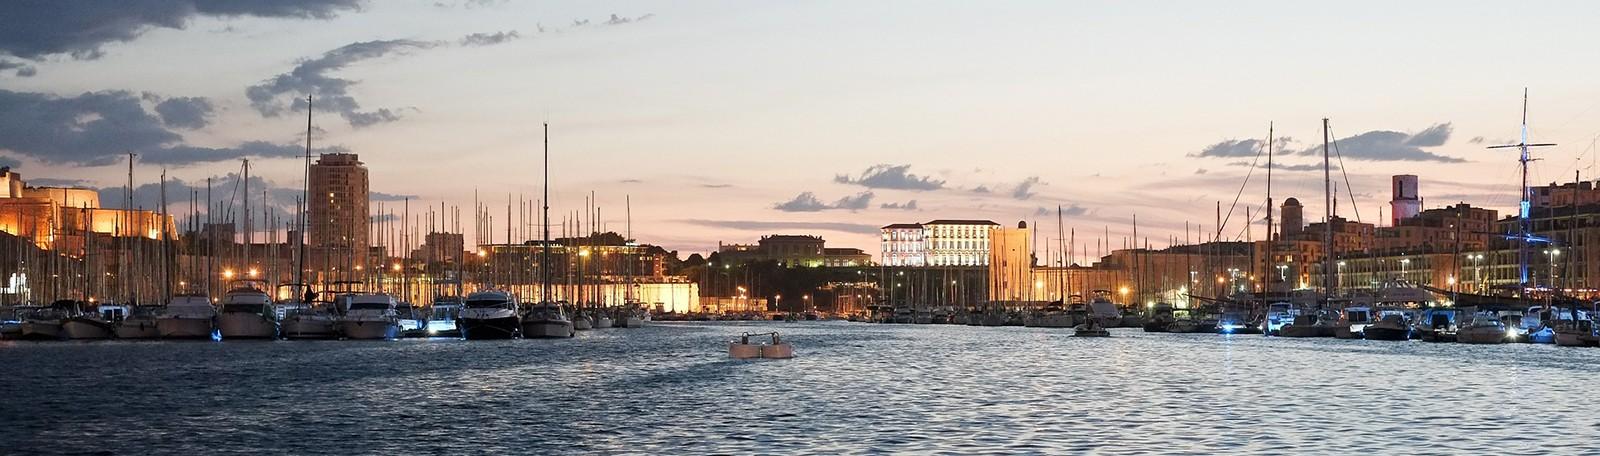 Q-Park Espercieux - Rue des Docks 13002 Marseille